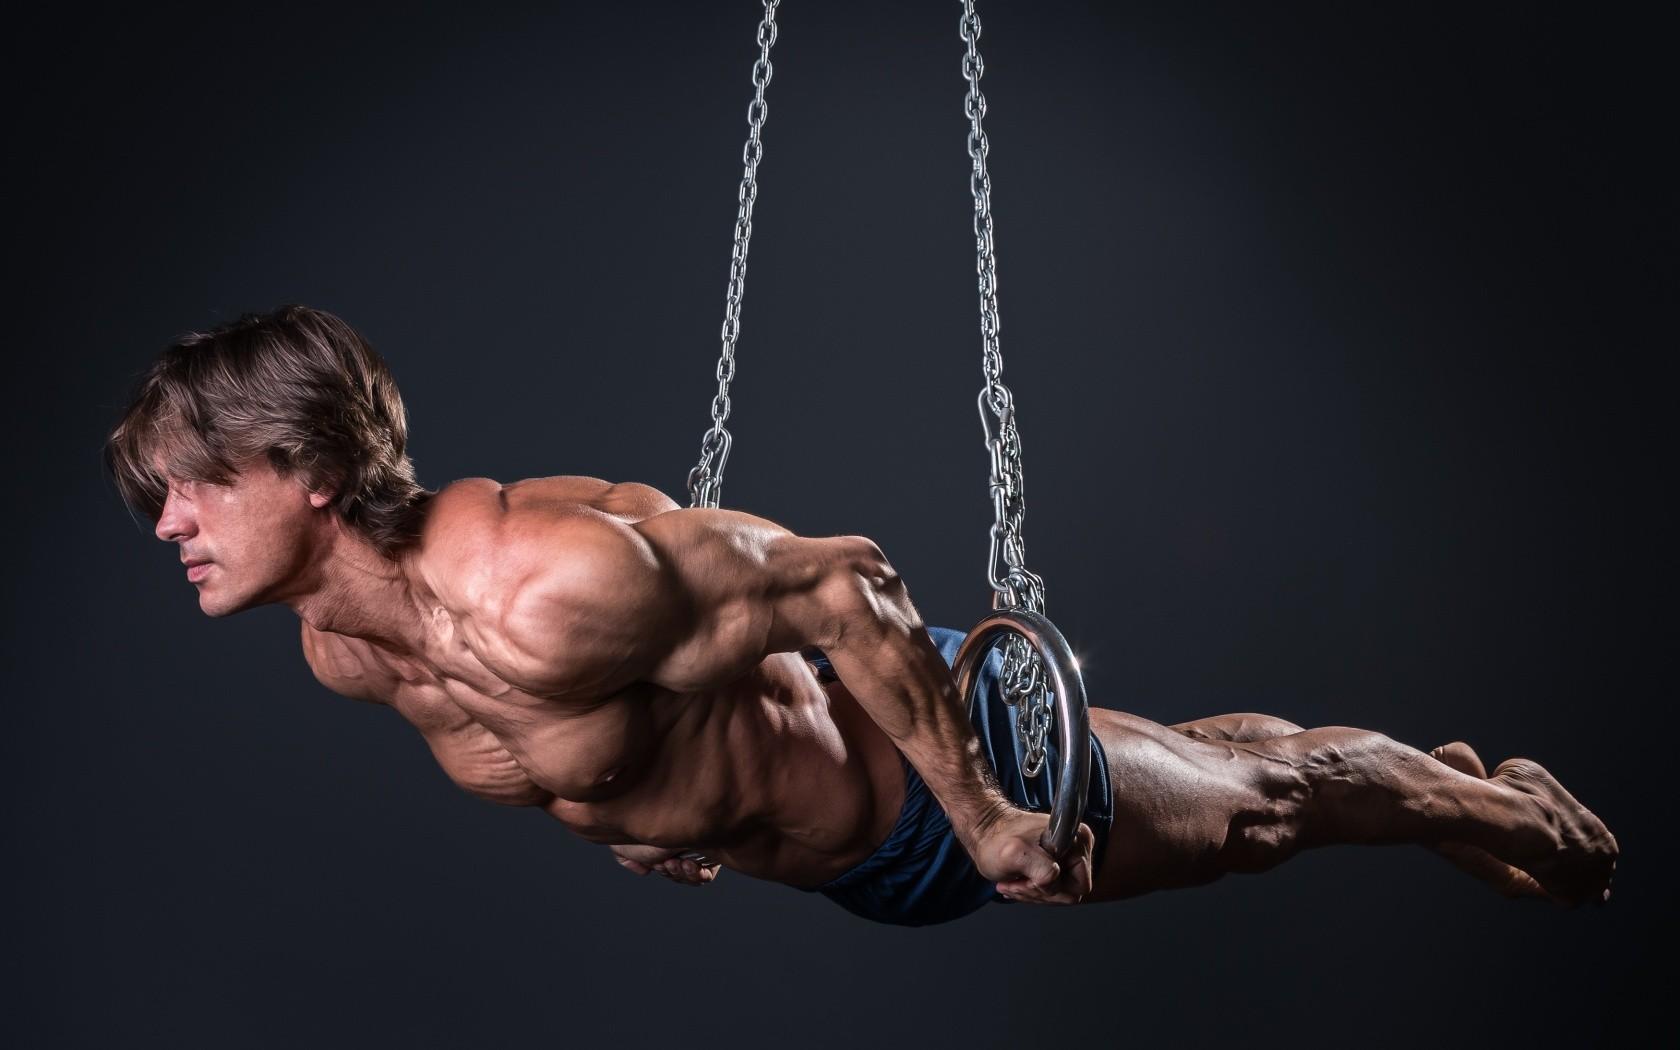 Men Sport Muscles Bodybuilding Muscle Arm Chest Human Body Wrestler